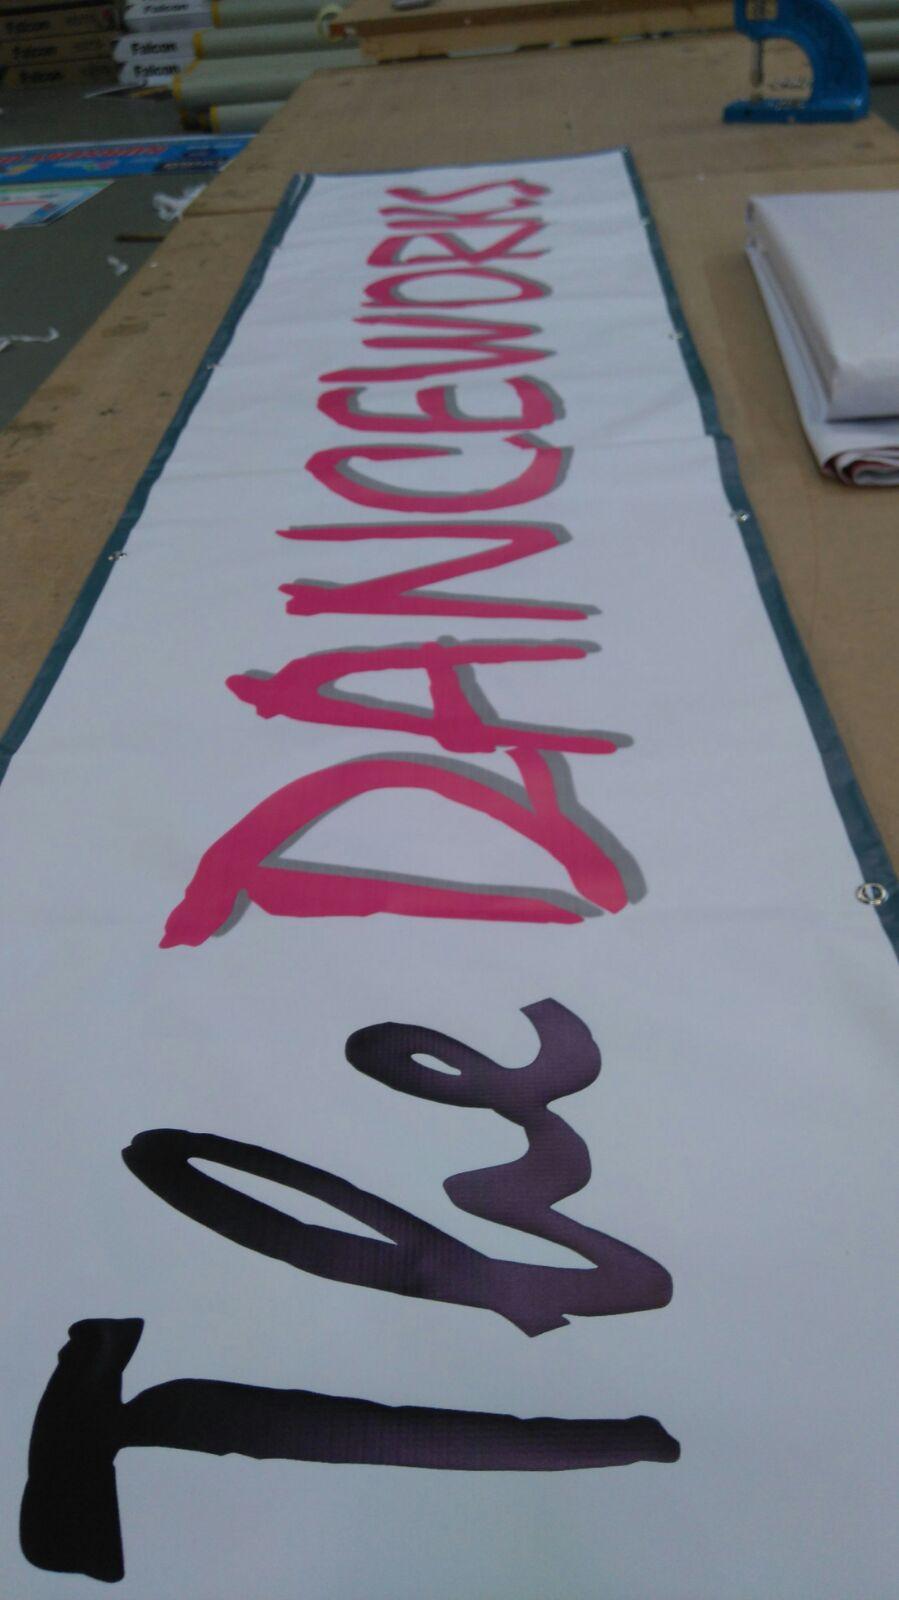 Banner Printing Buy 2 Get 1 Free Vinyl Banners Printing Uk